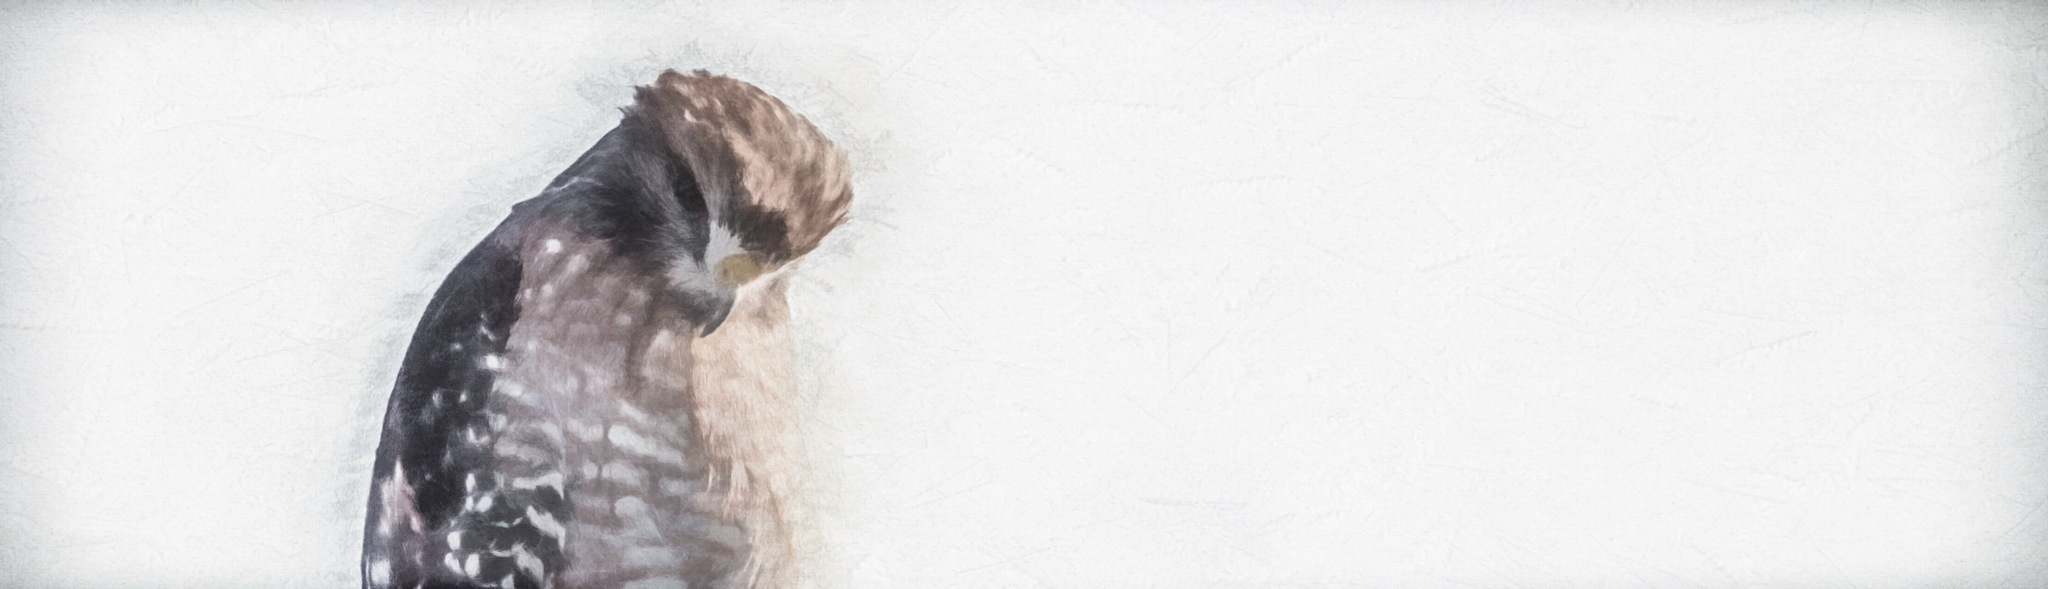 Hawk Sketch 4 by JohnEllingson